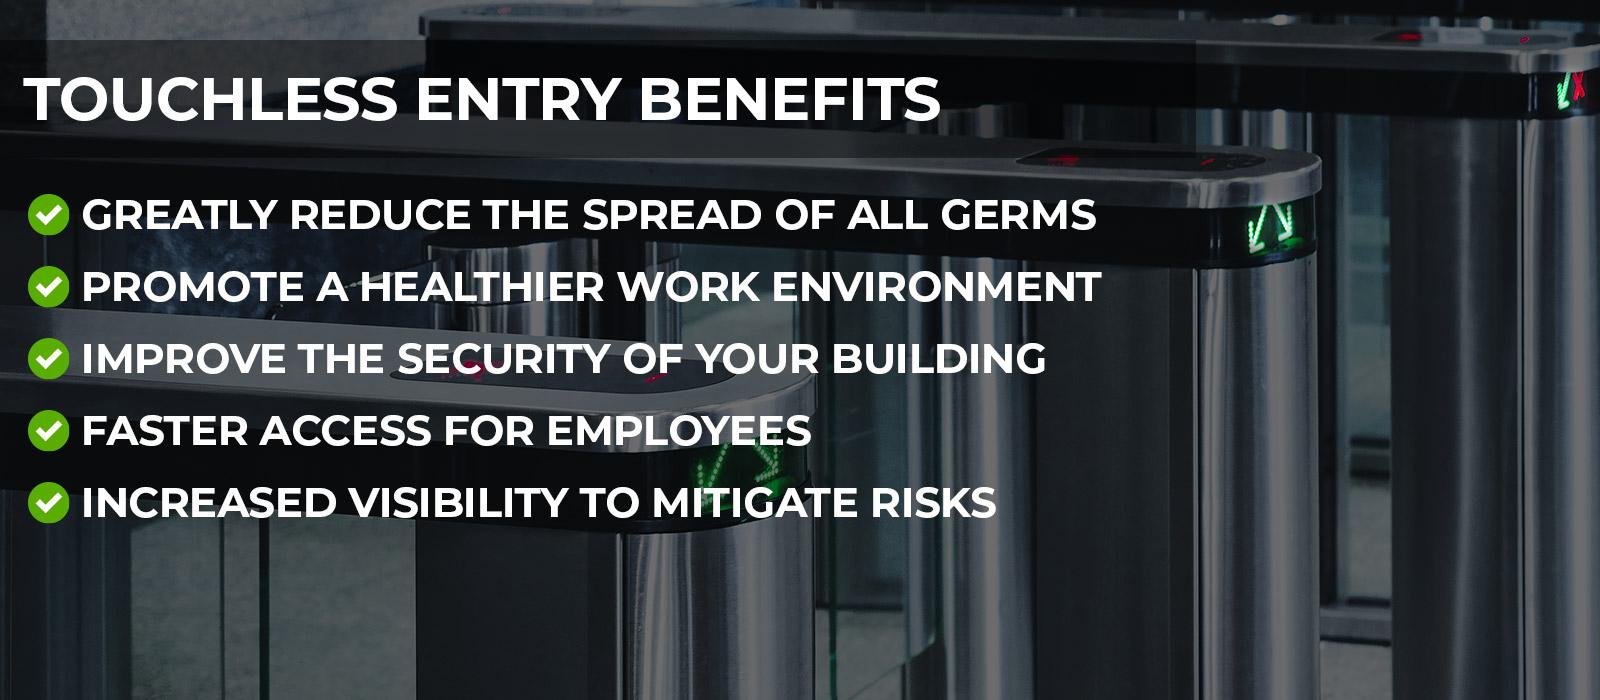 CRV Surveillance - Touchless Entry Benefits